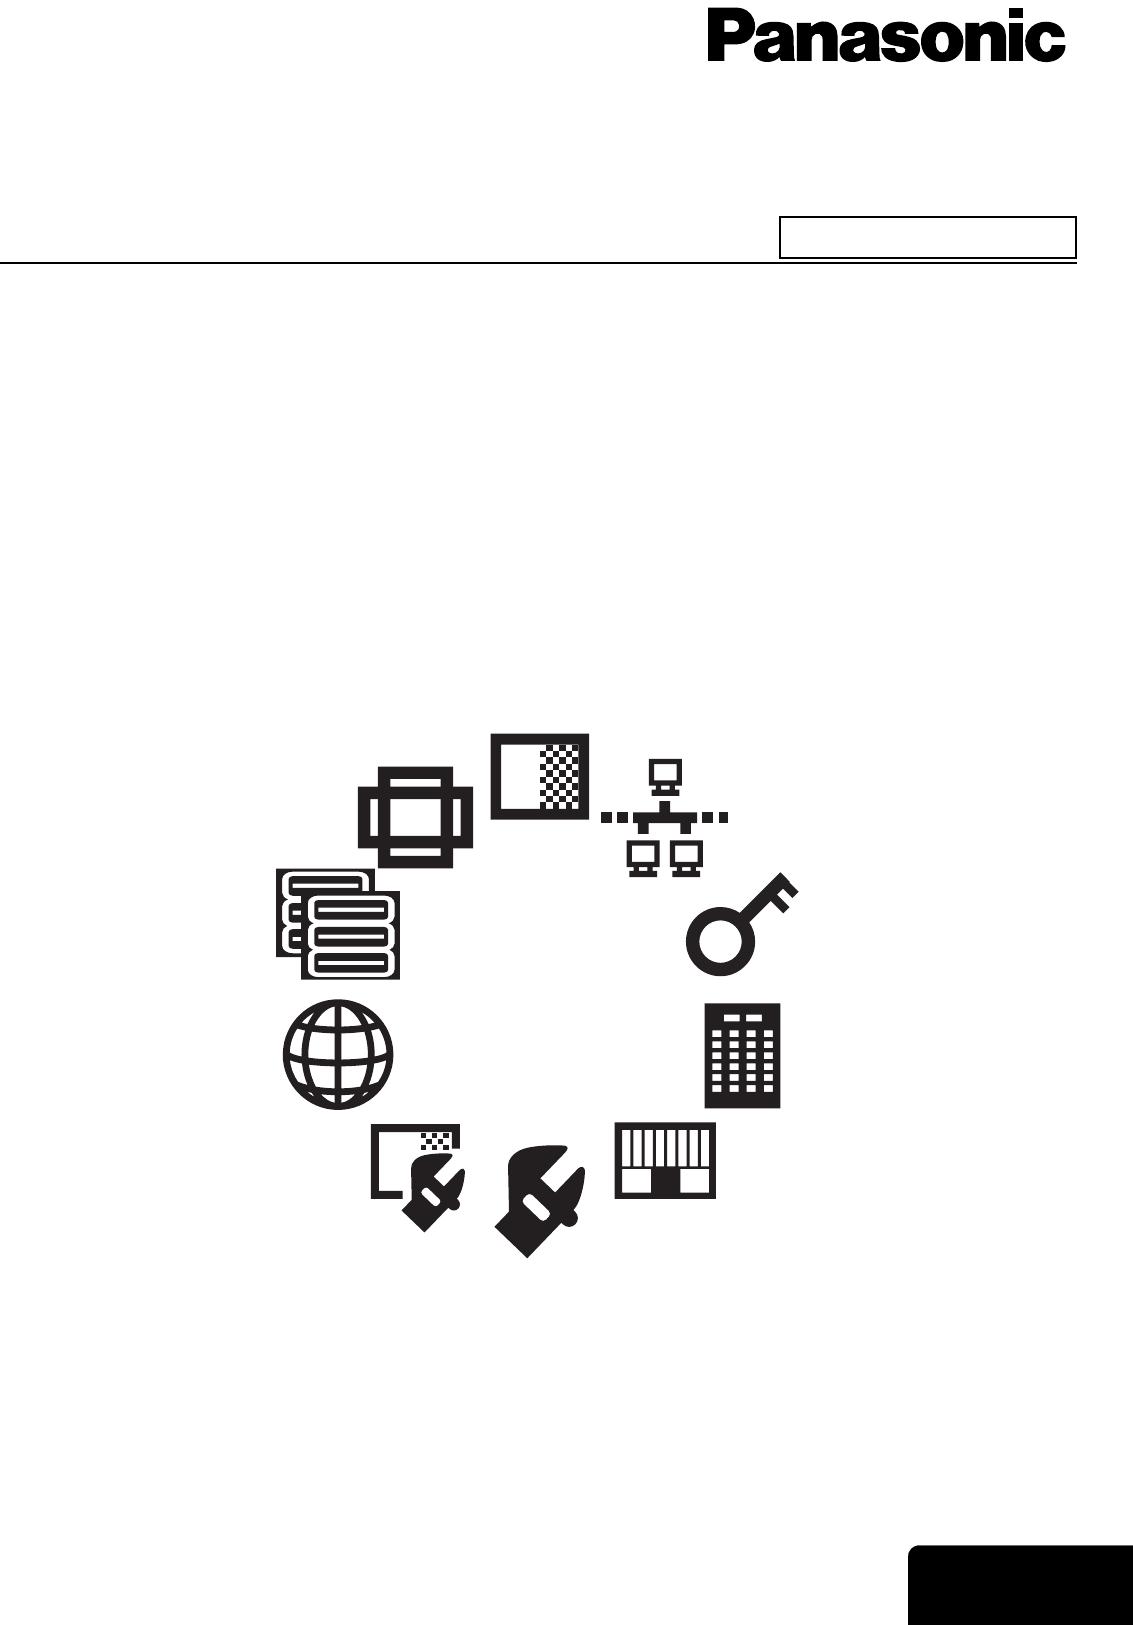 Handleiding Panasonic PT-DW6300 (pagina 1 van 52) (English)